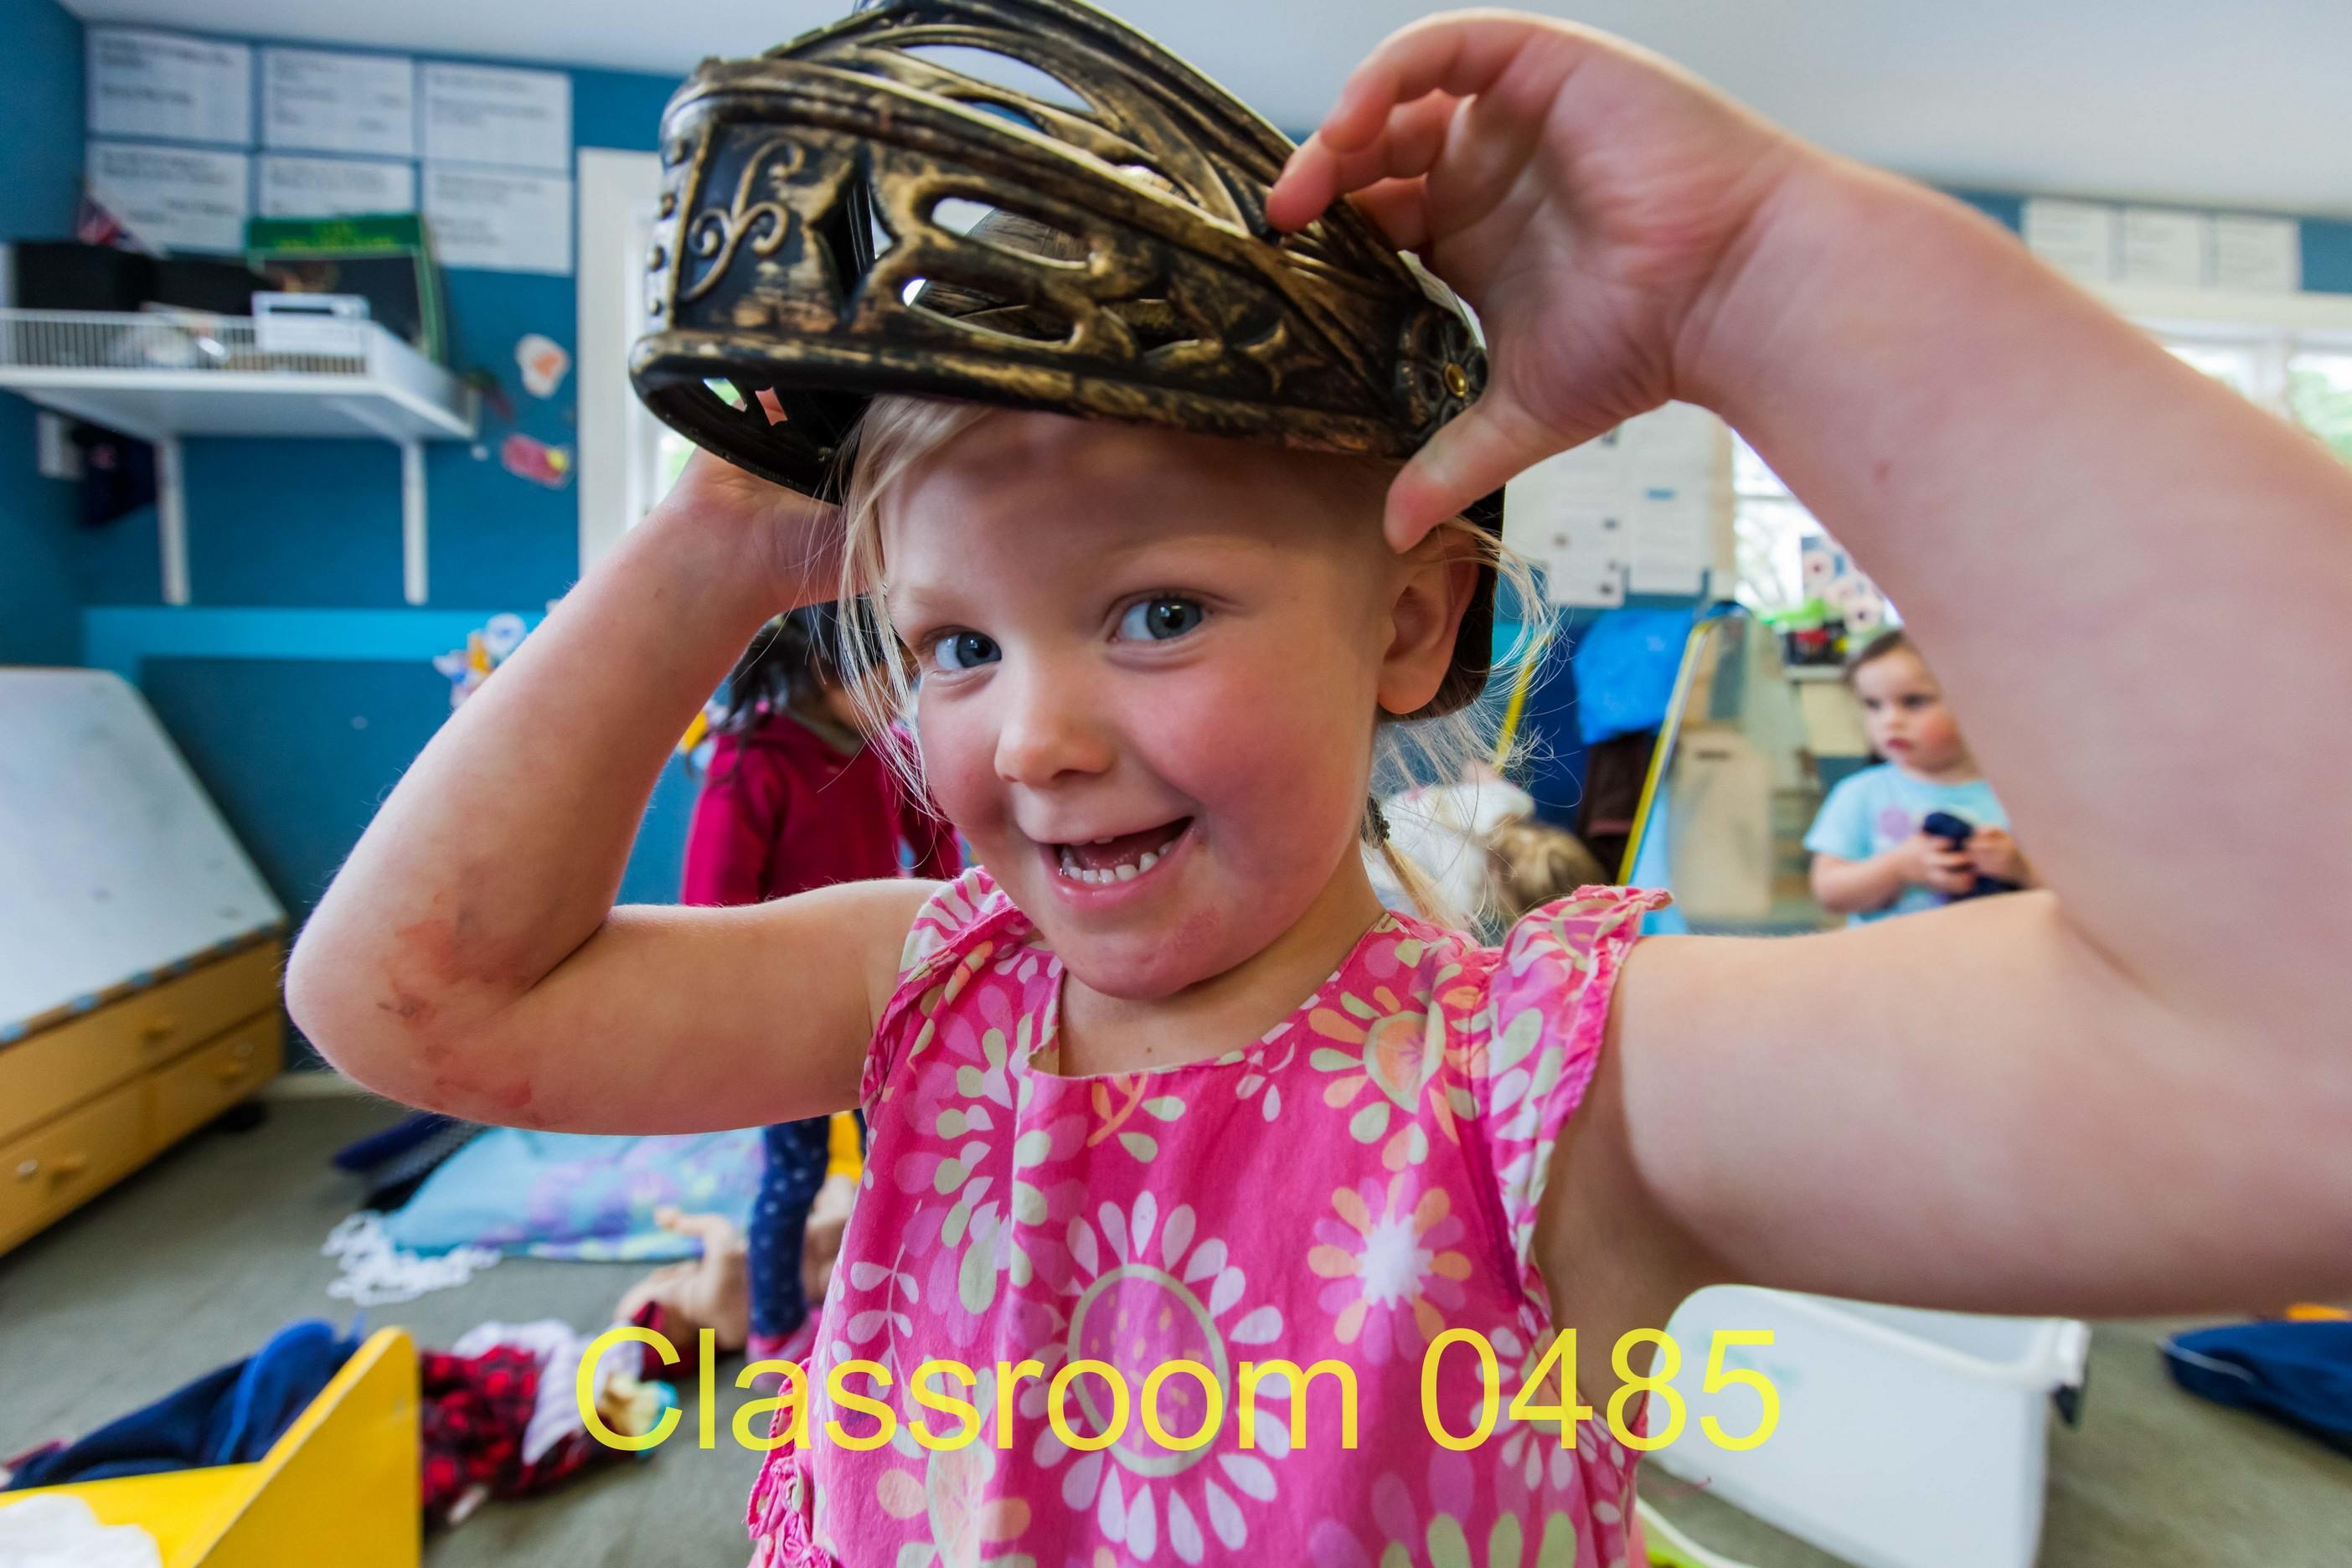 Classroom 0485